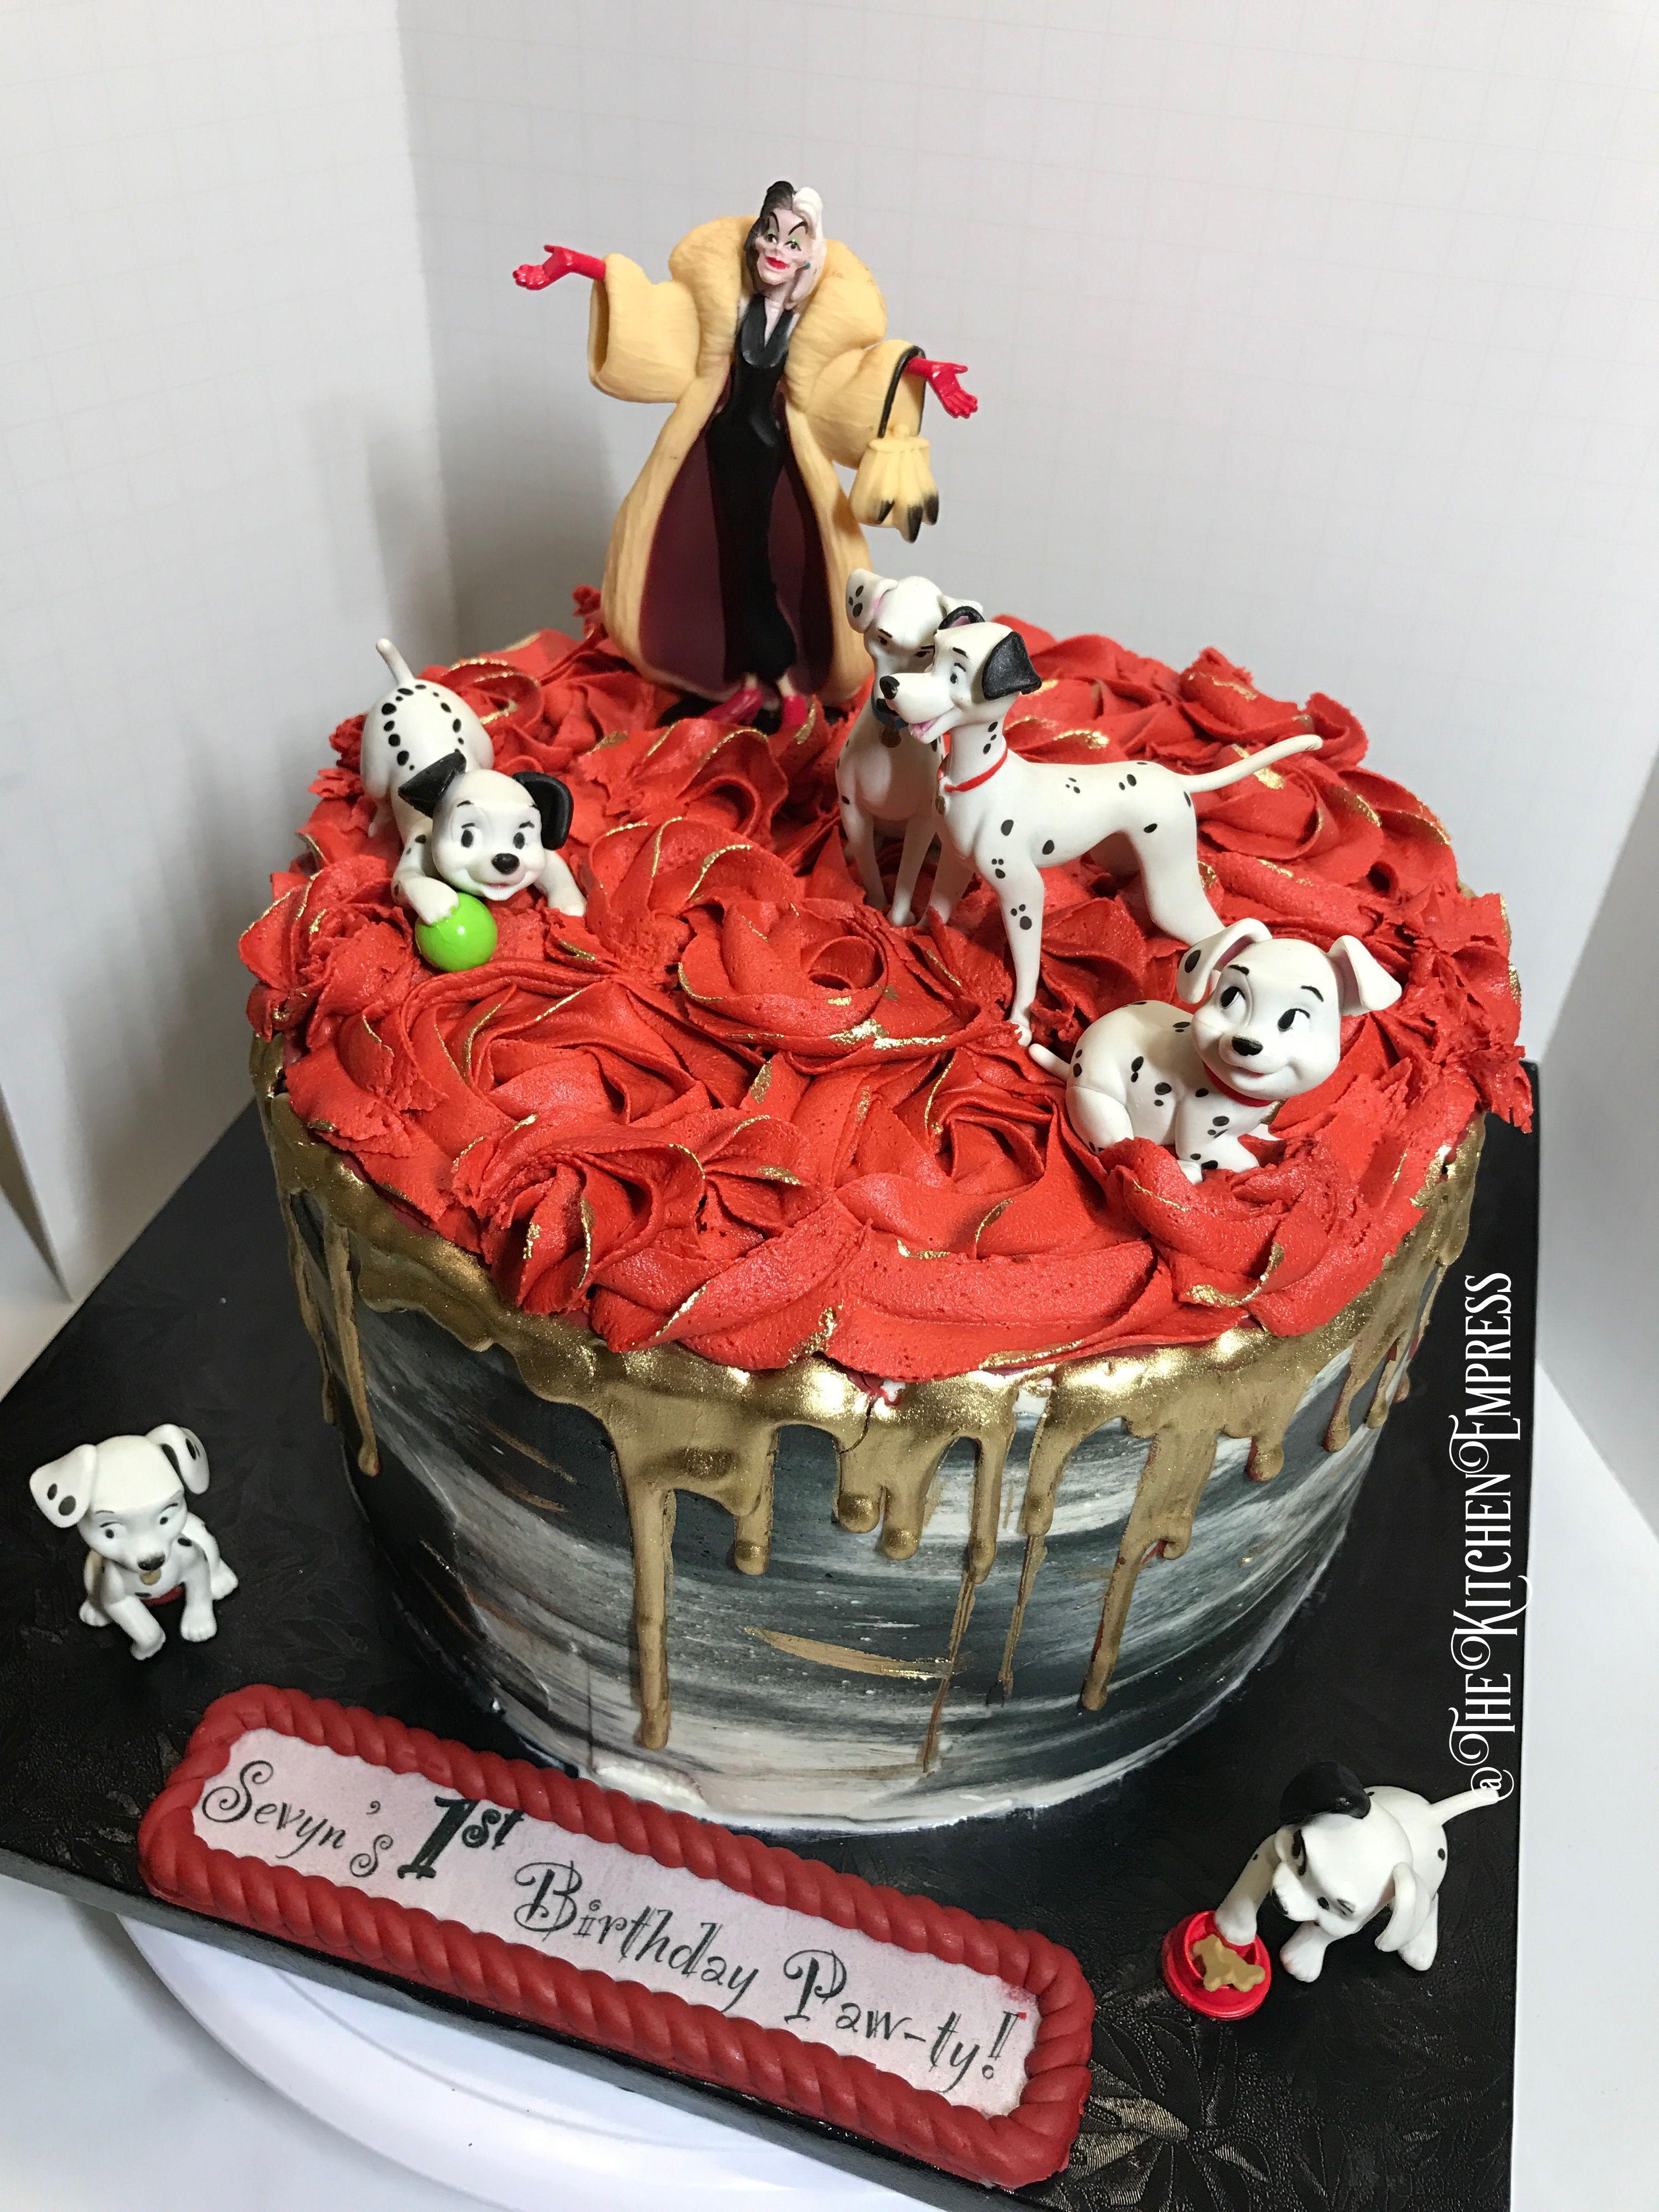 101 Dalmations Buttercream Cake Buttercream Cake Cake Butter Cream